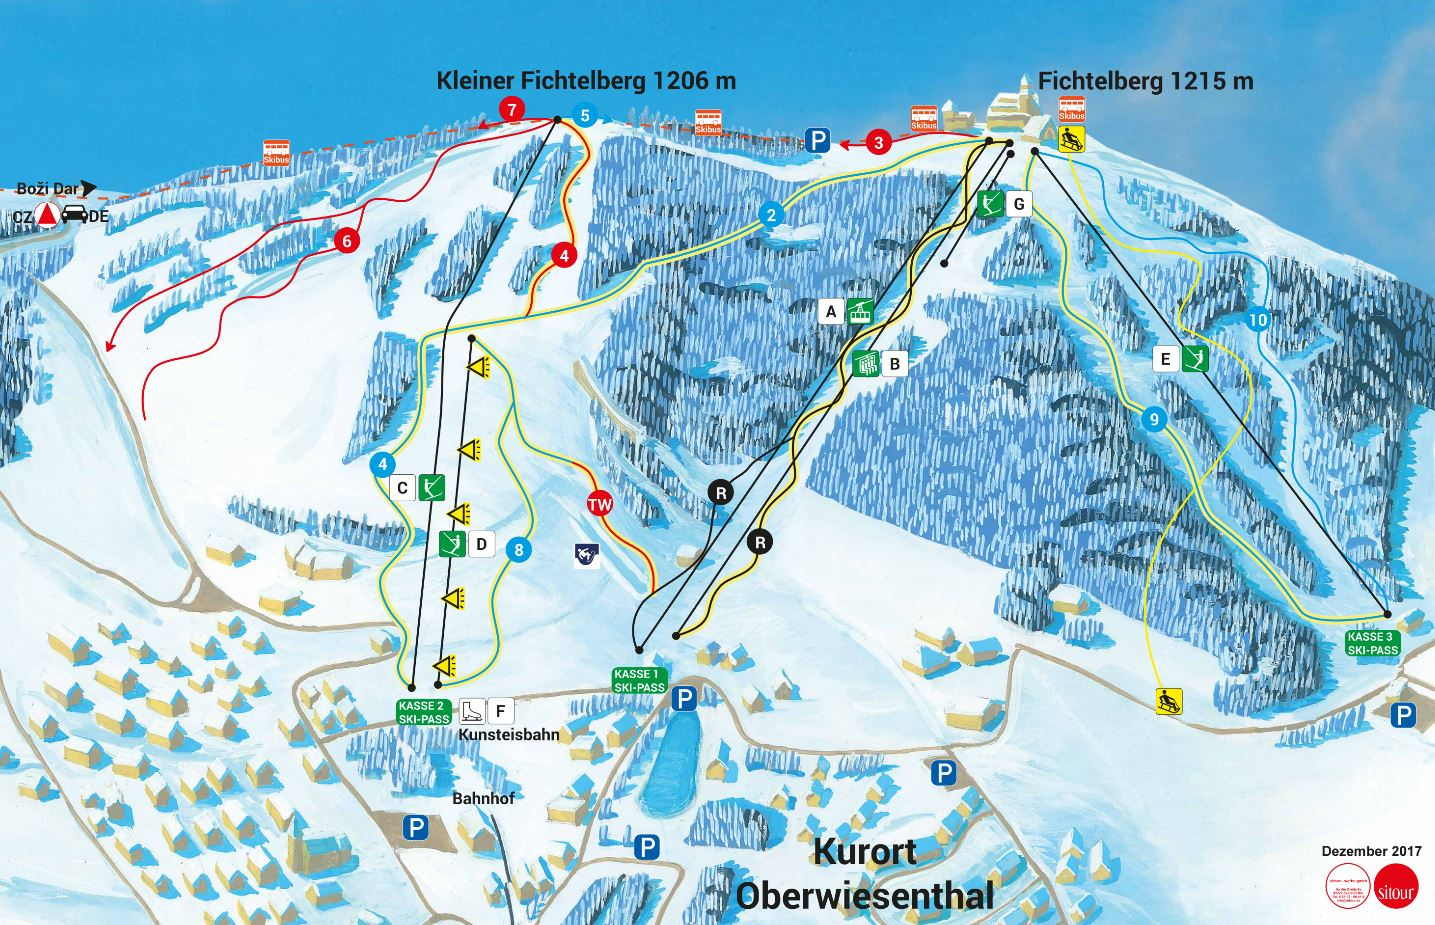 Fichtelberg Piste / Trail Map